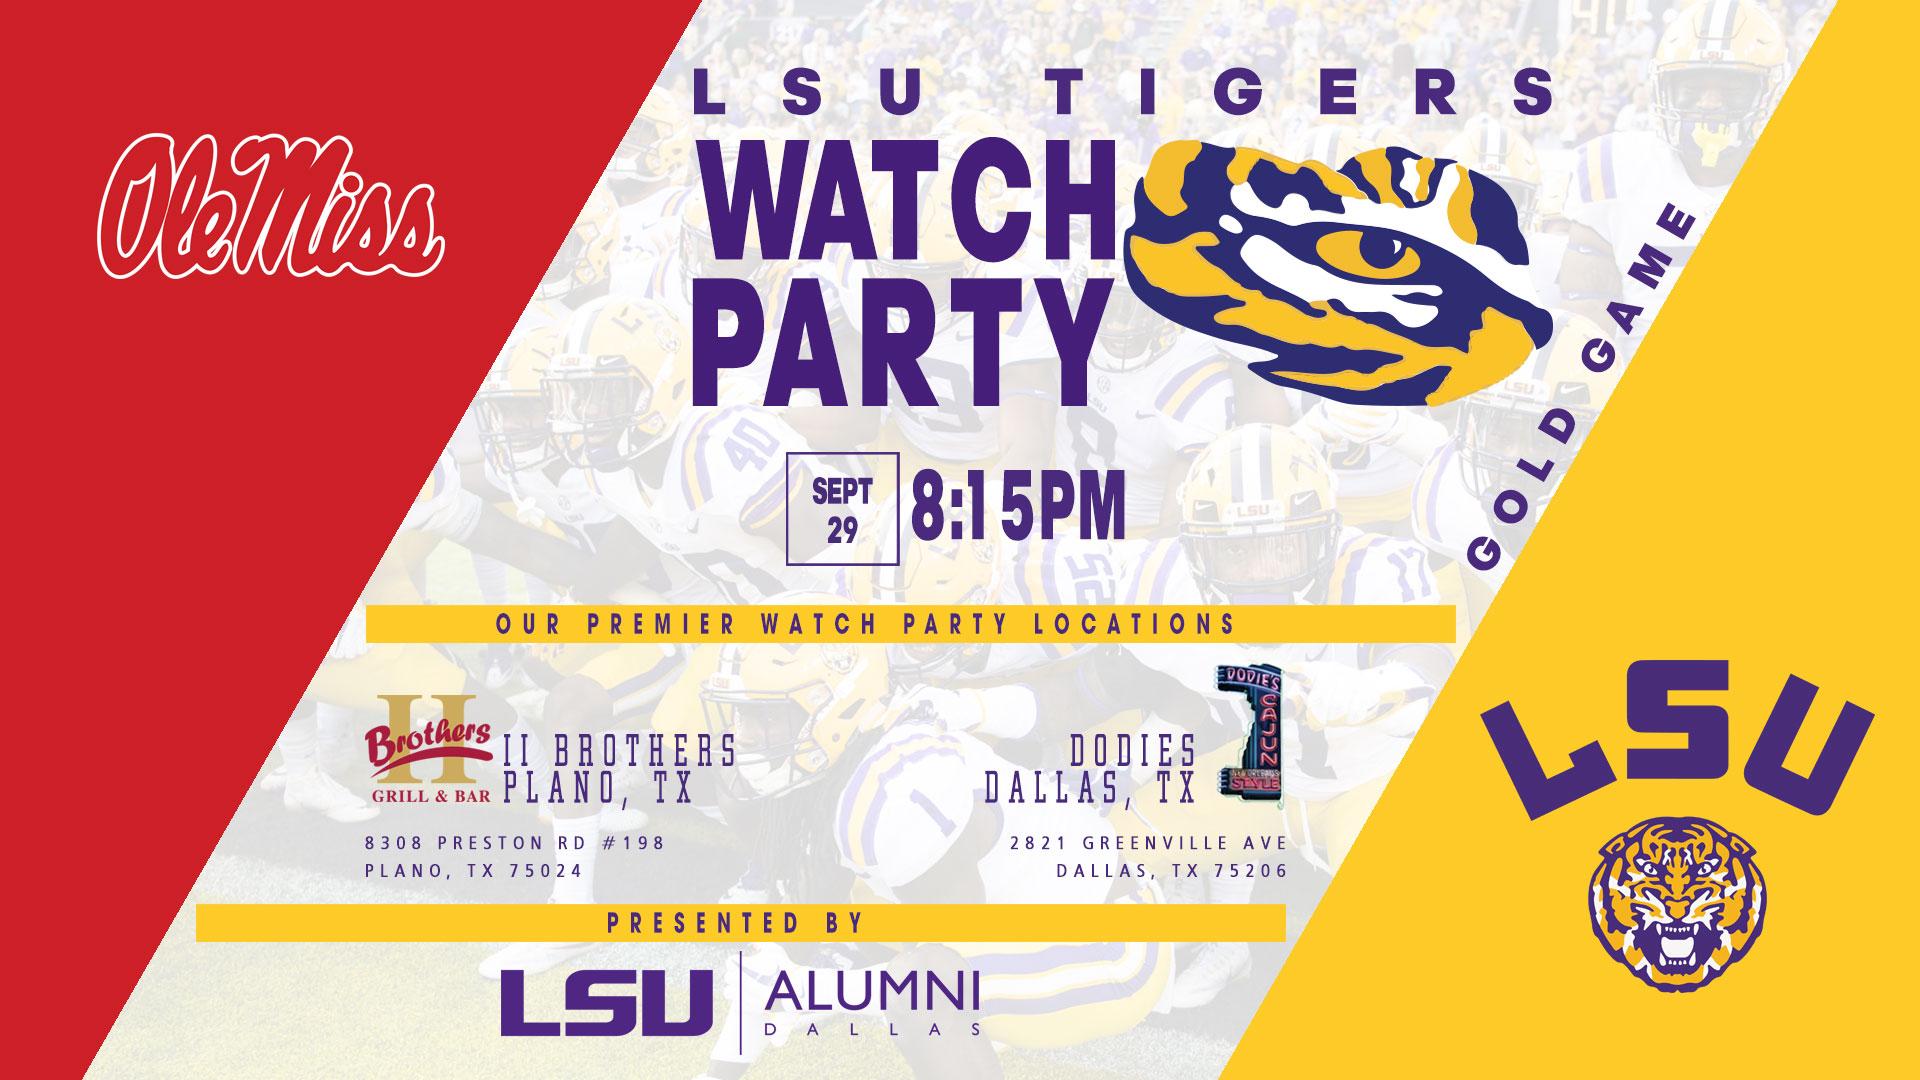 LSU Alumni Dallas Watch Party – LSU vs Ole Miss